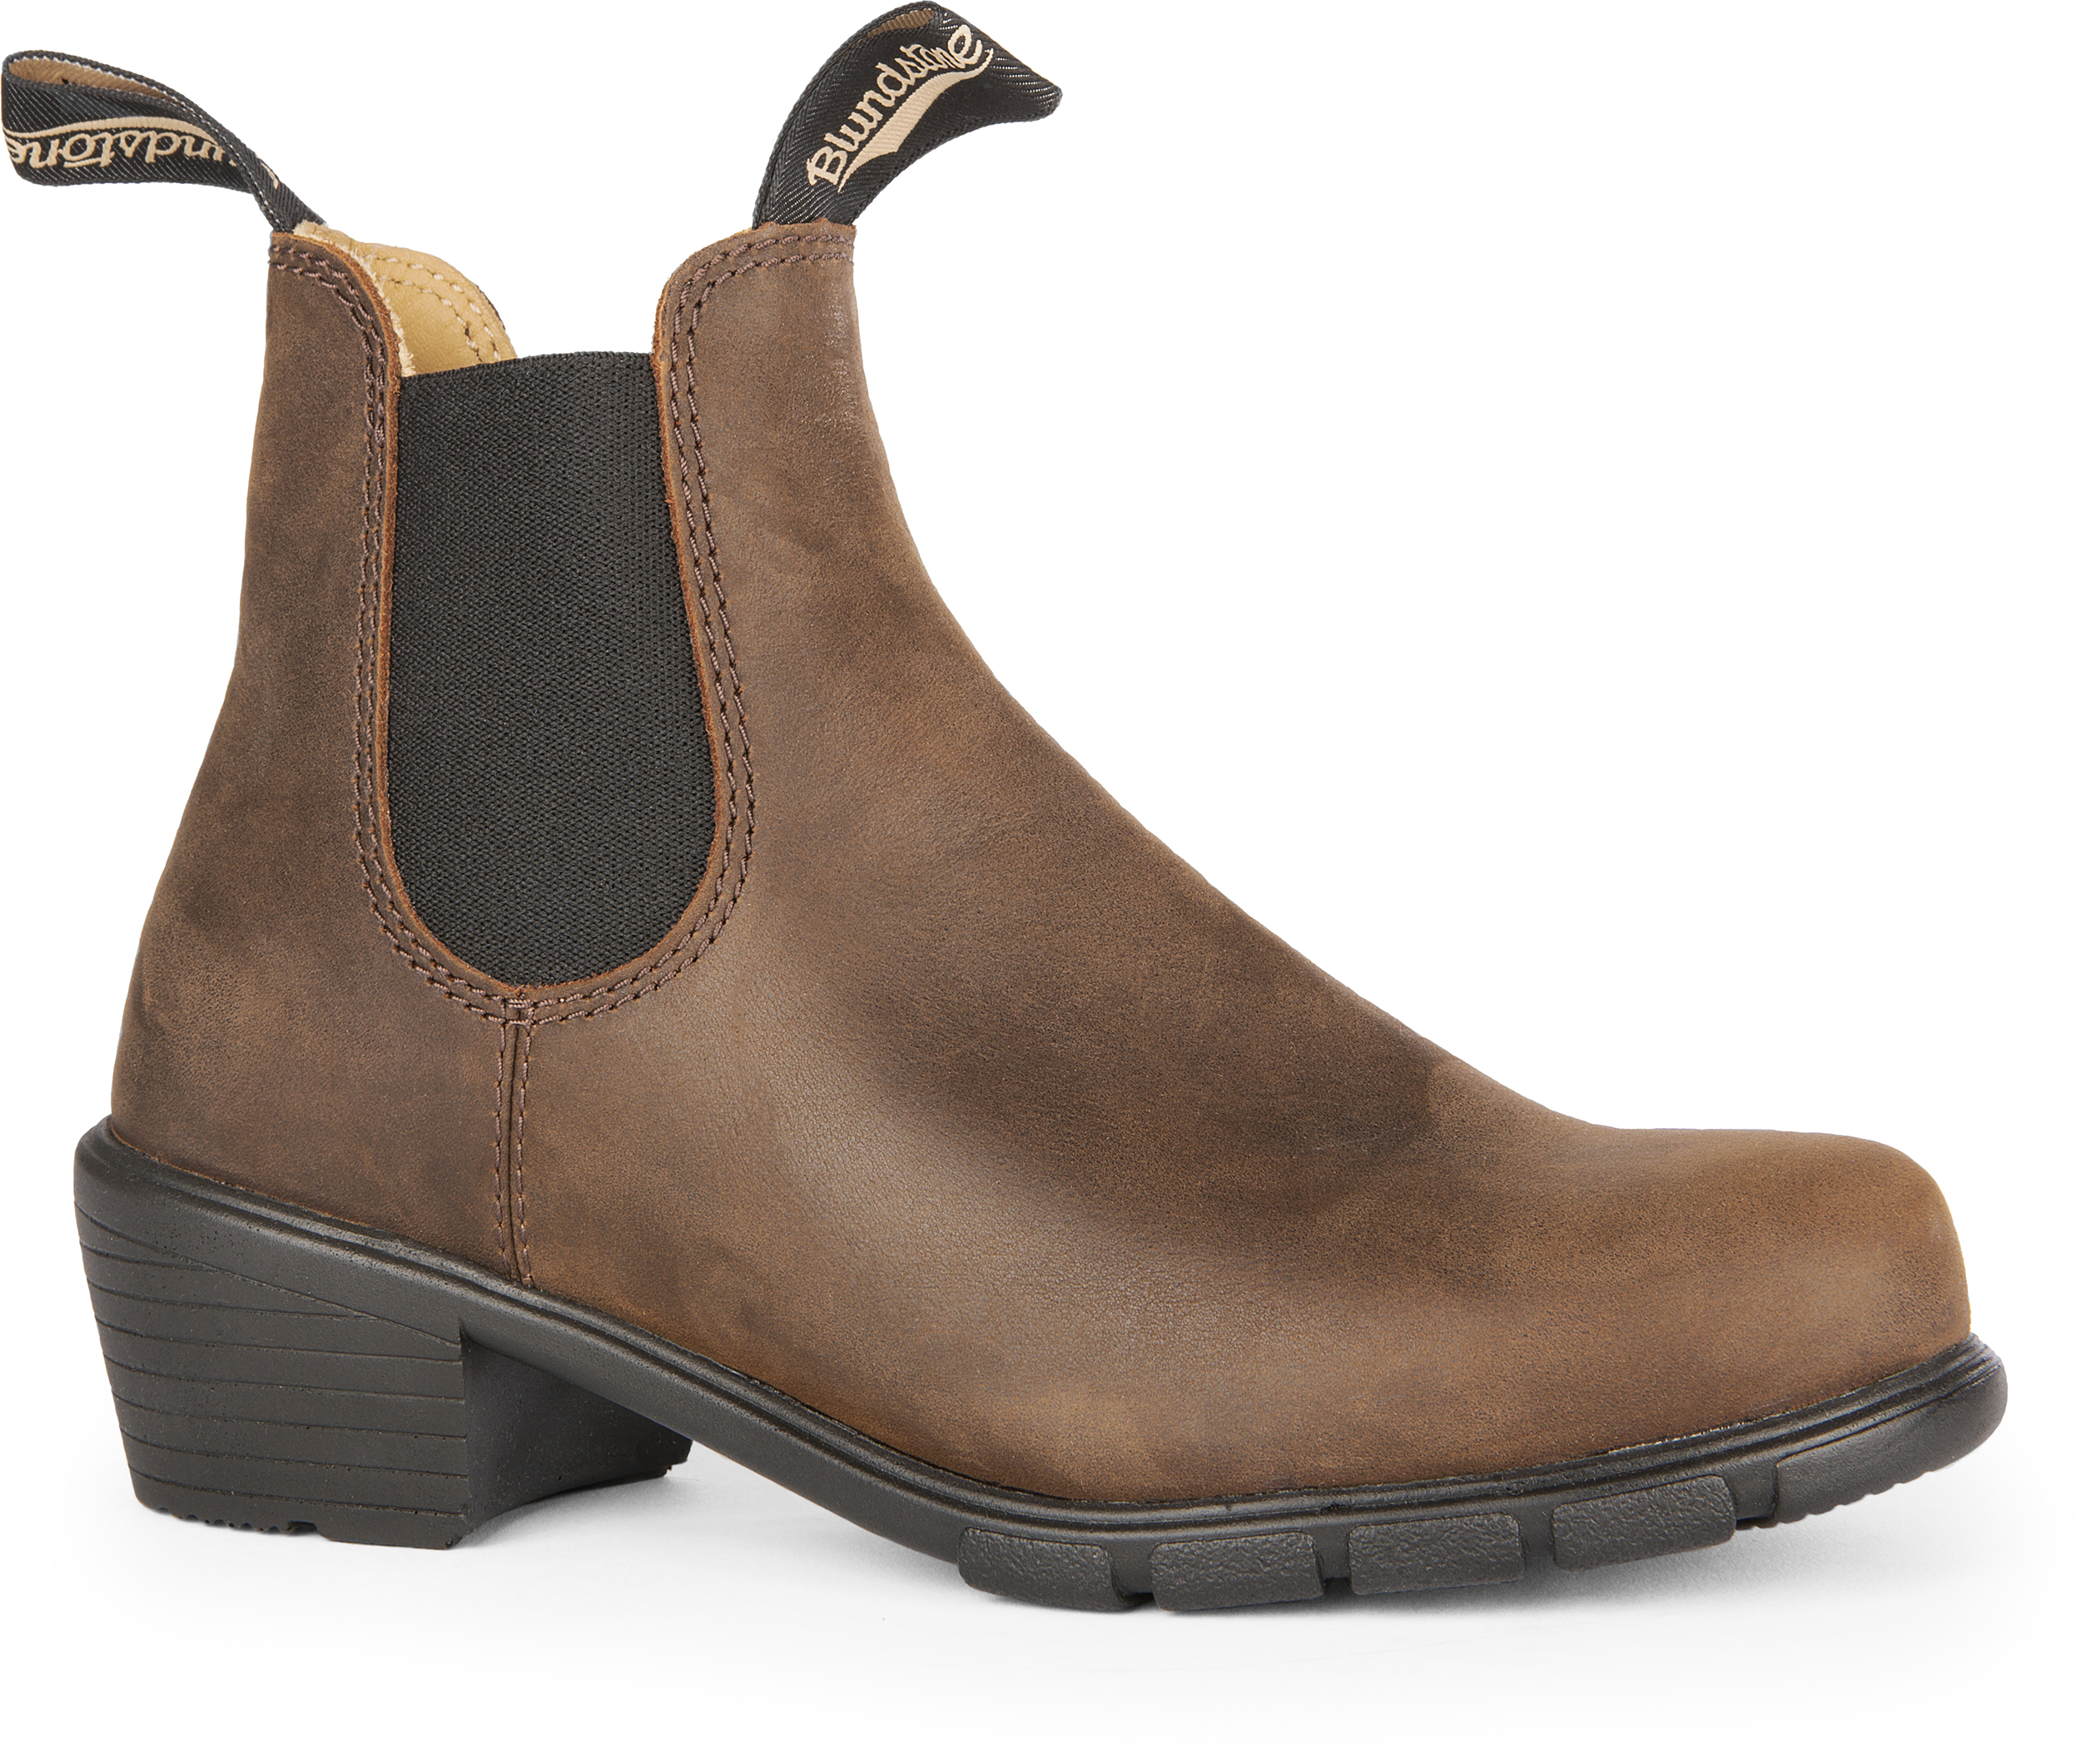 ed6fbe5f3474 Boots